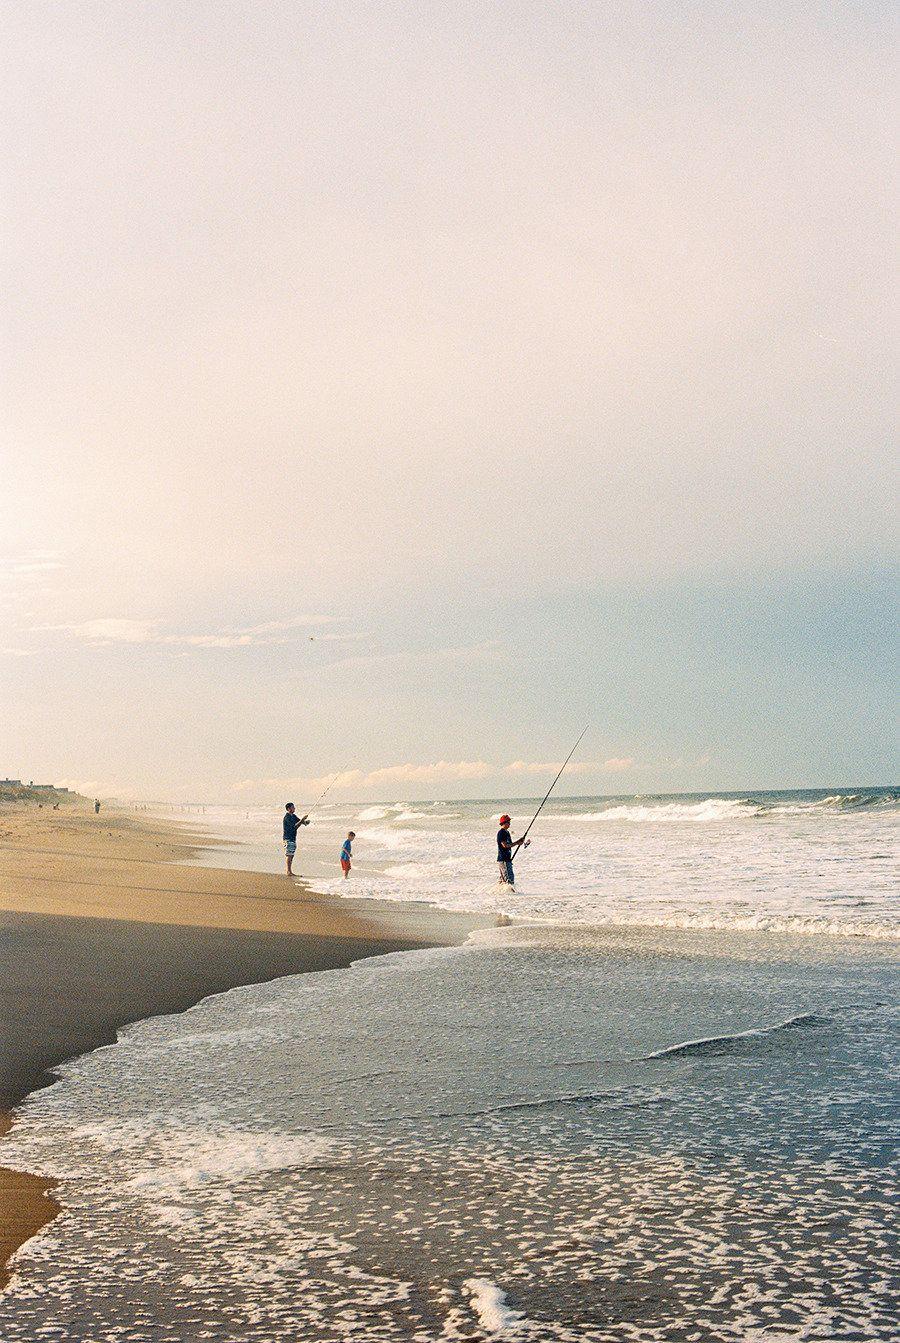 #fishing, #travel, #outer-banks, #north-carolina  Photography: Elaine Palladino - elainepalladino.com  Read More: http://www.stylemepretty.com/living/2013/06/20/the-outer-banks-from-elaine-palladino/